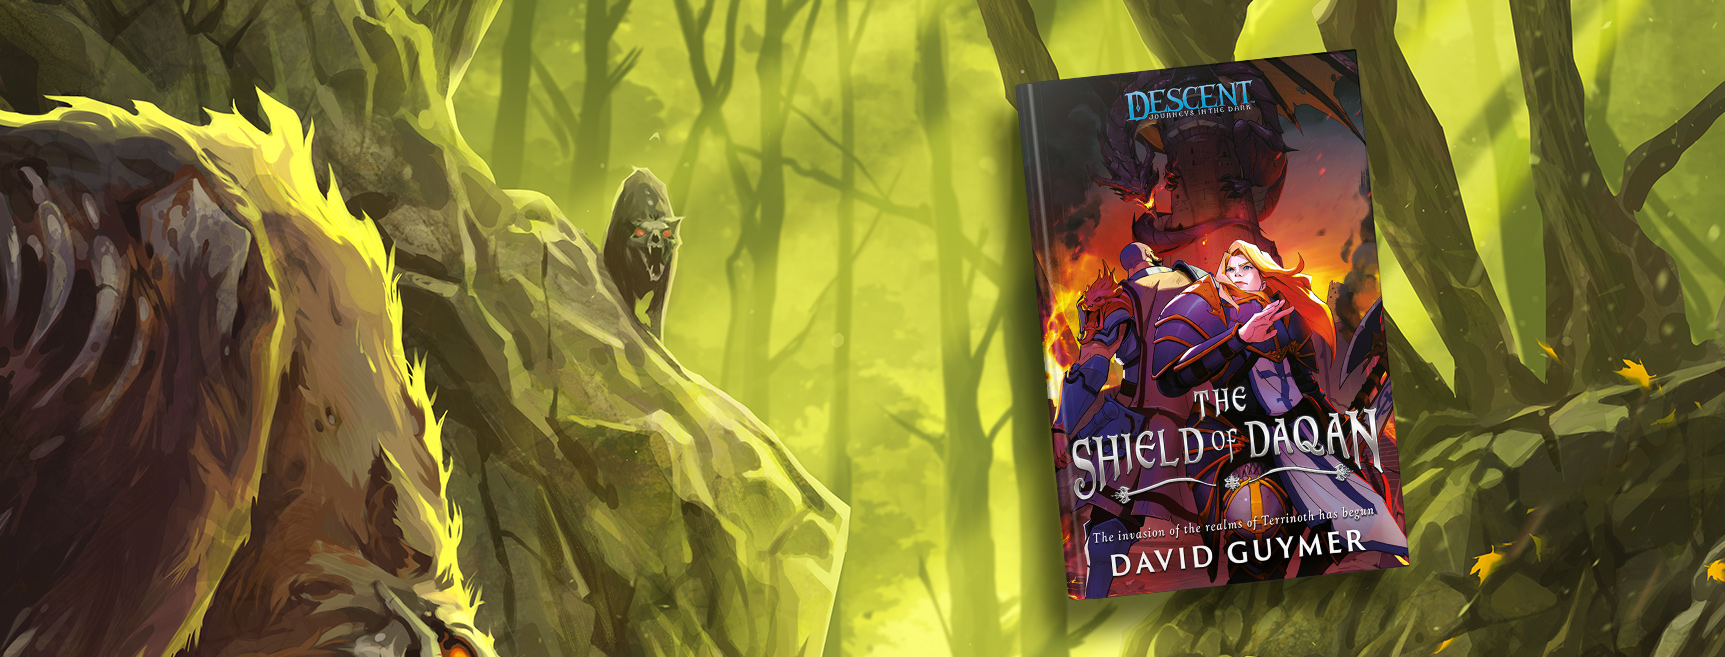 Descent: The Shield of Daqan by David Guymer